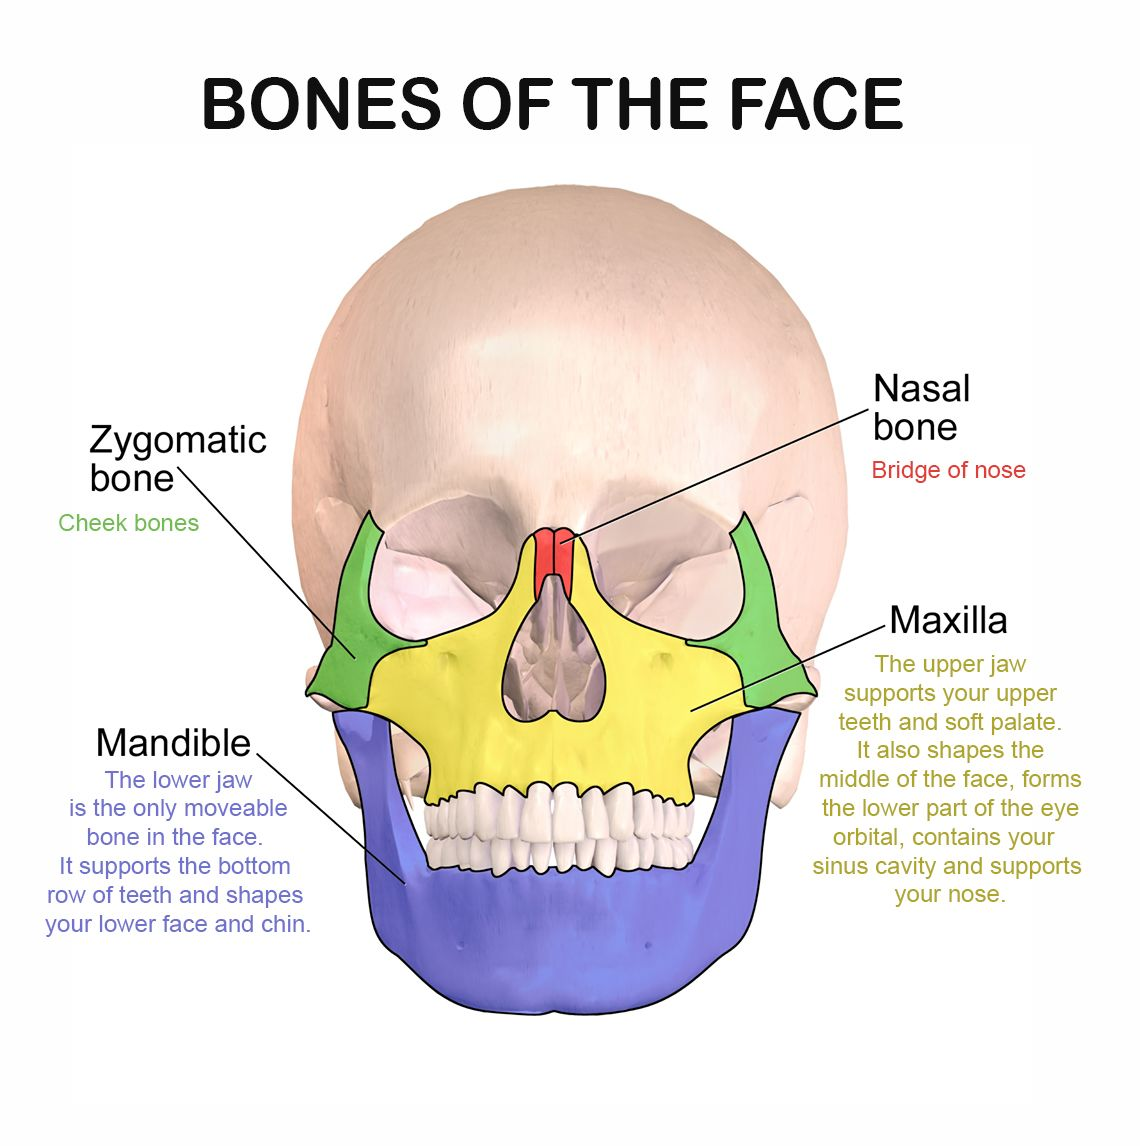 facial bones and their function dental anatomy human anatomy facial bones dental hygiene [ 1140 x 1146 Pixel ]